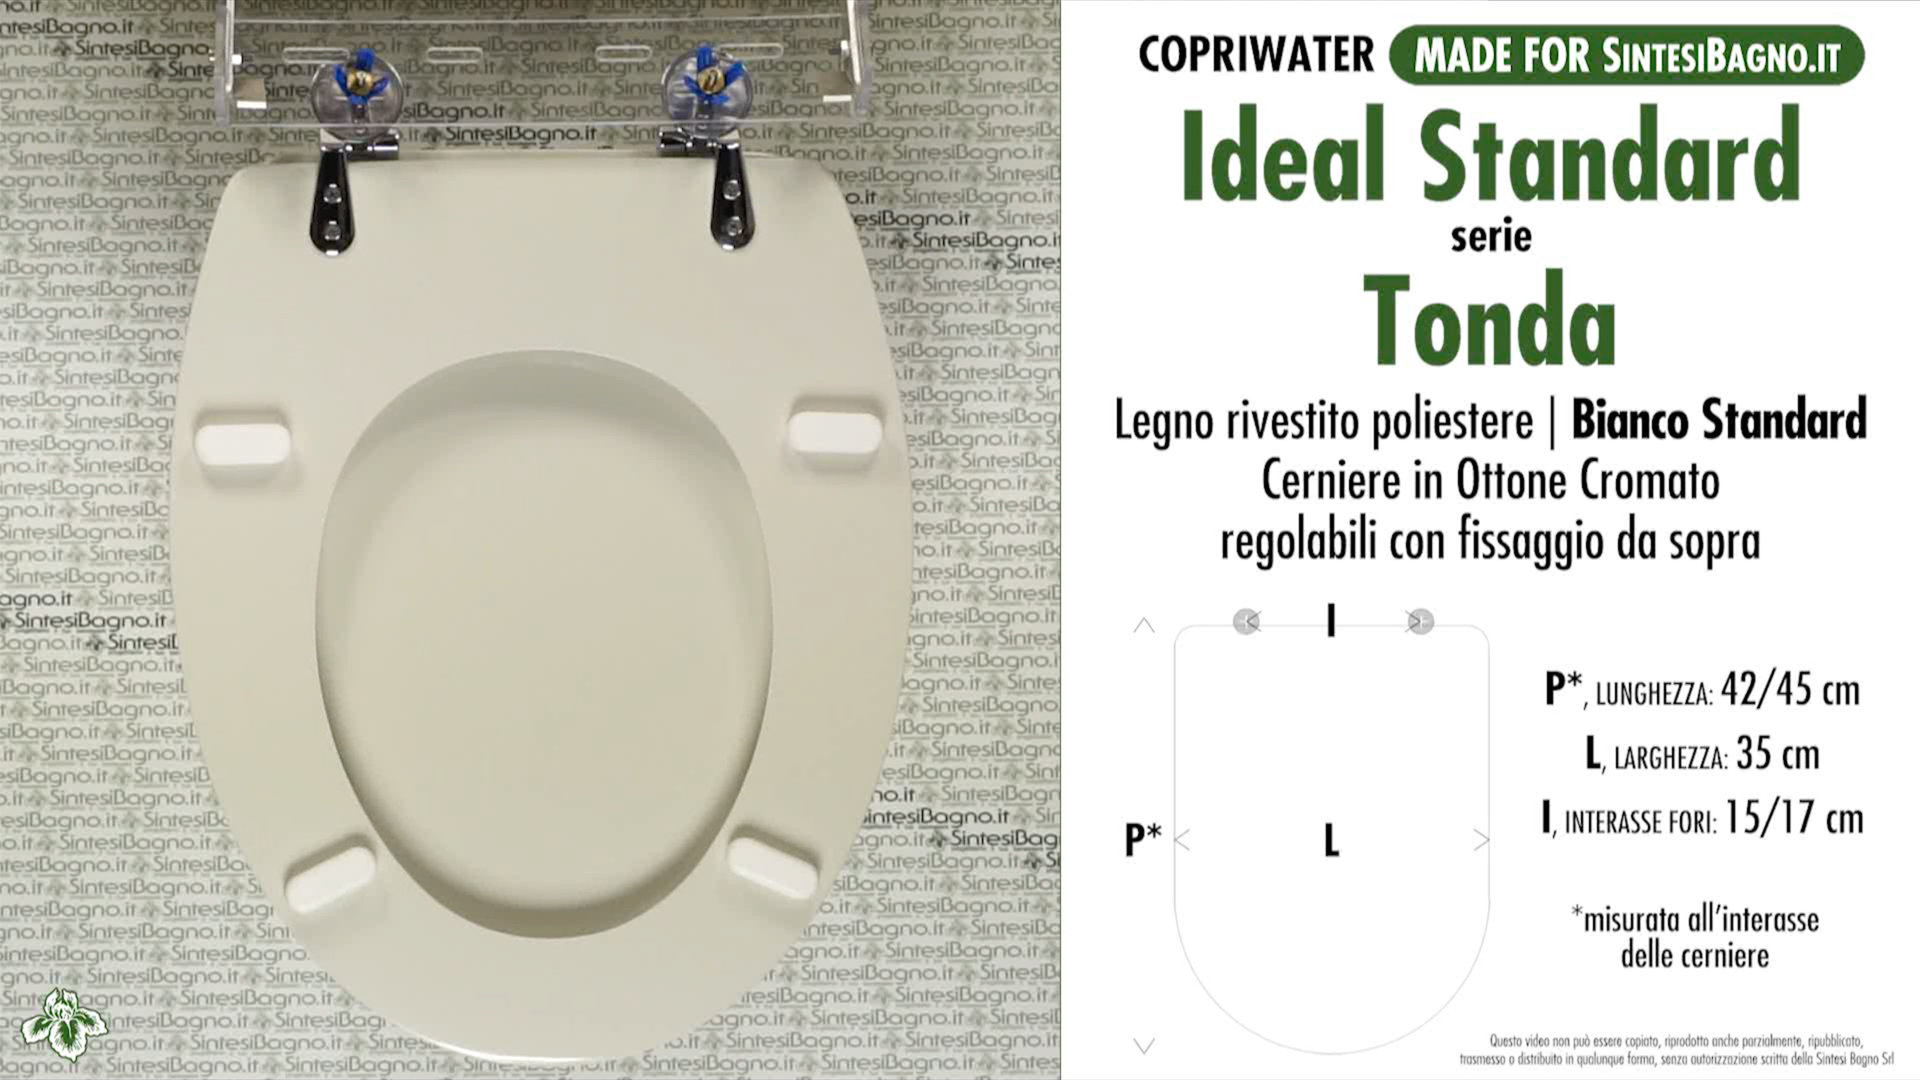 Sedile Wc Ideal Standard Serie Tonda.Copriwater Per Wc Tonda Ideal Standard Bianco Standard Ricambio Dedicato Sintesibagno Shop Online